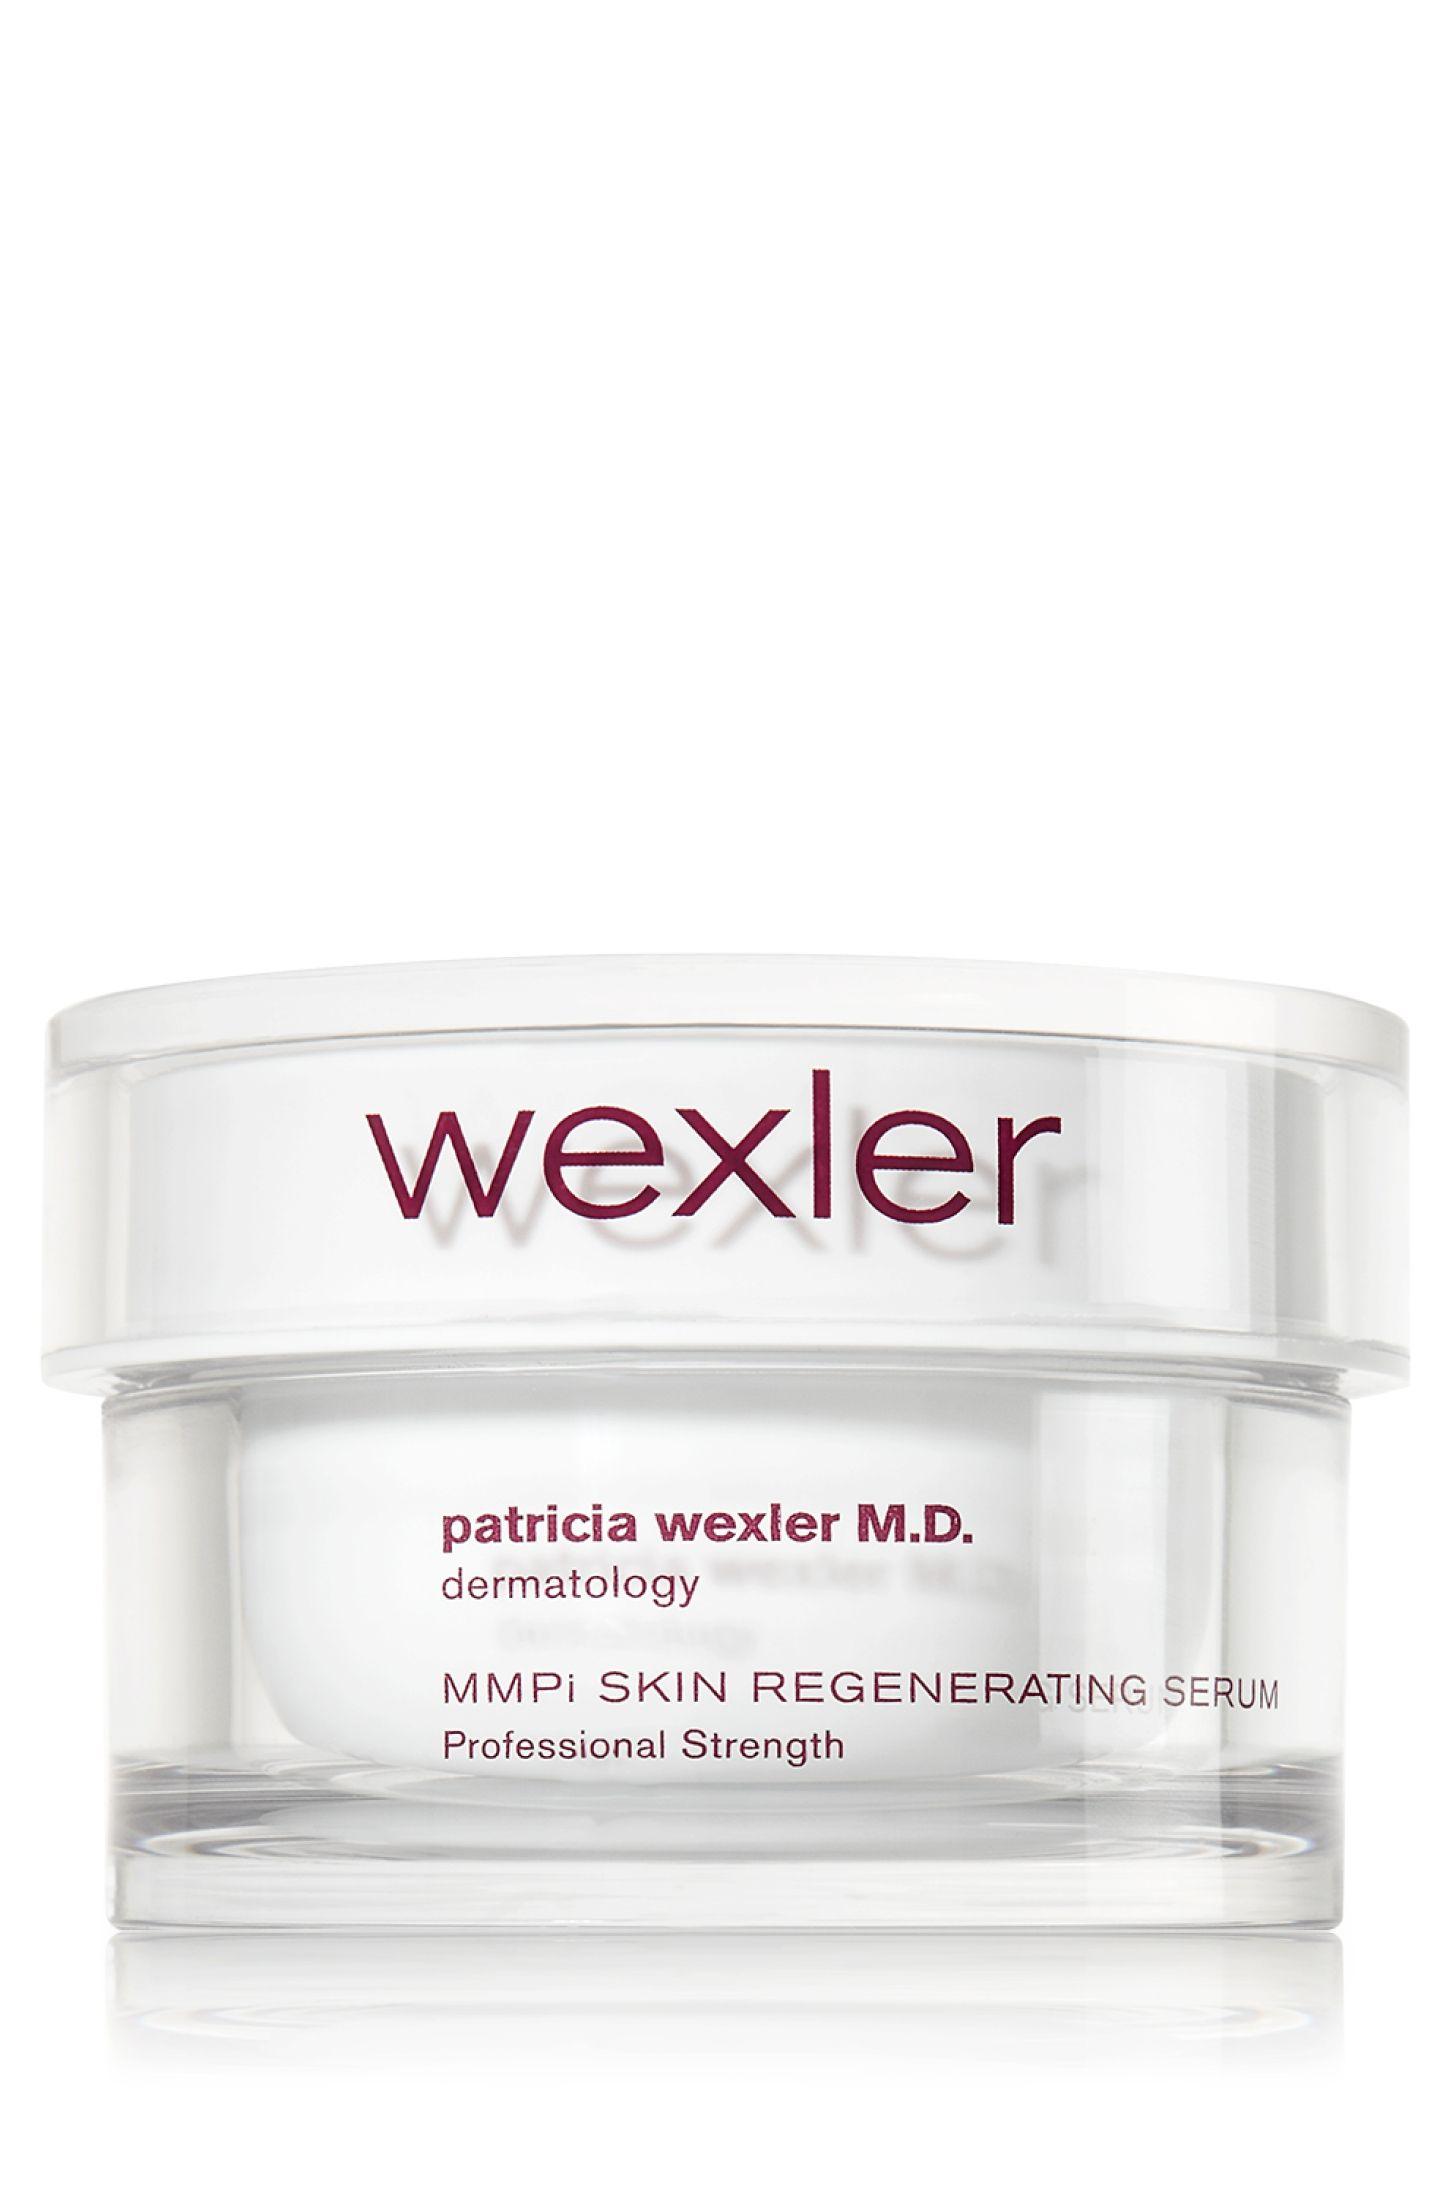 Mmpi 20 Skin Regenerating Serum 3 4 Oz Patricia Wexler M D Bath Body Works Already Ha Best Anti Aging Serum Anti Aging Beauty Secrets Best Moisturizer